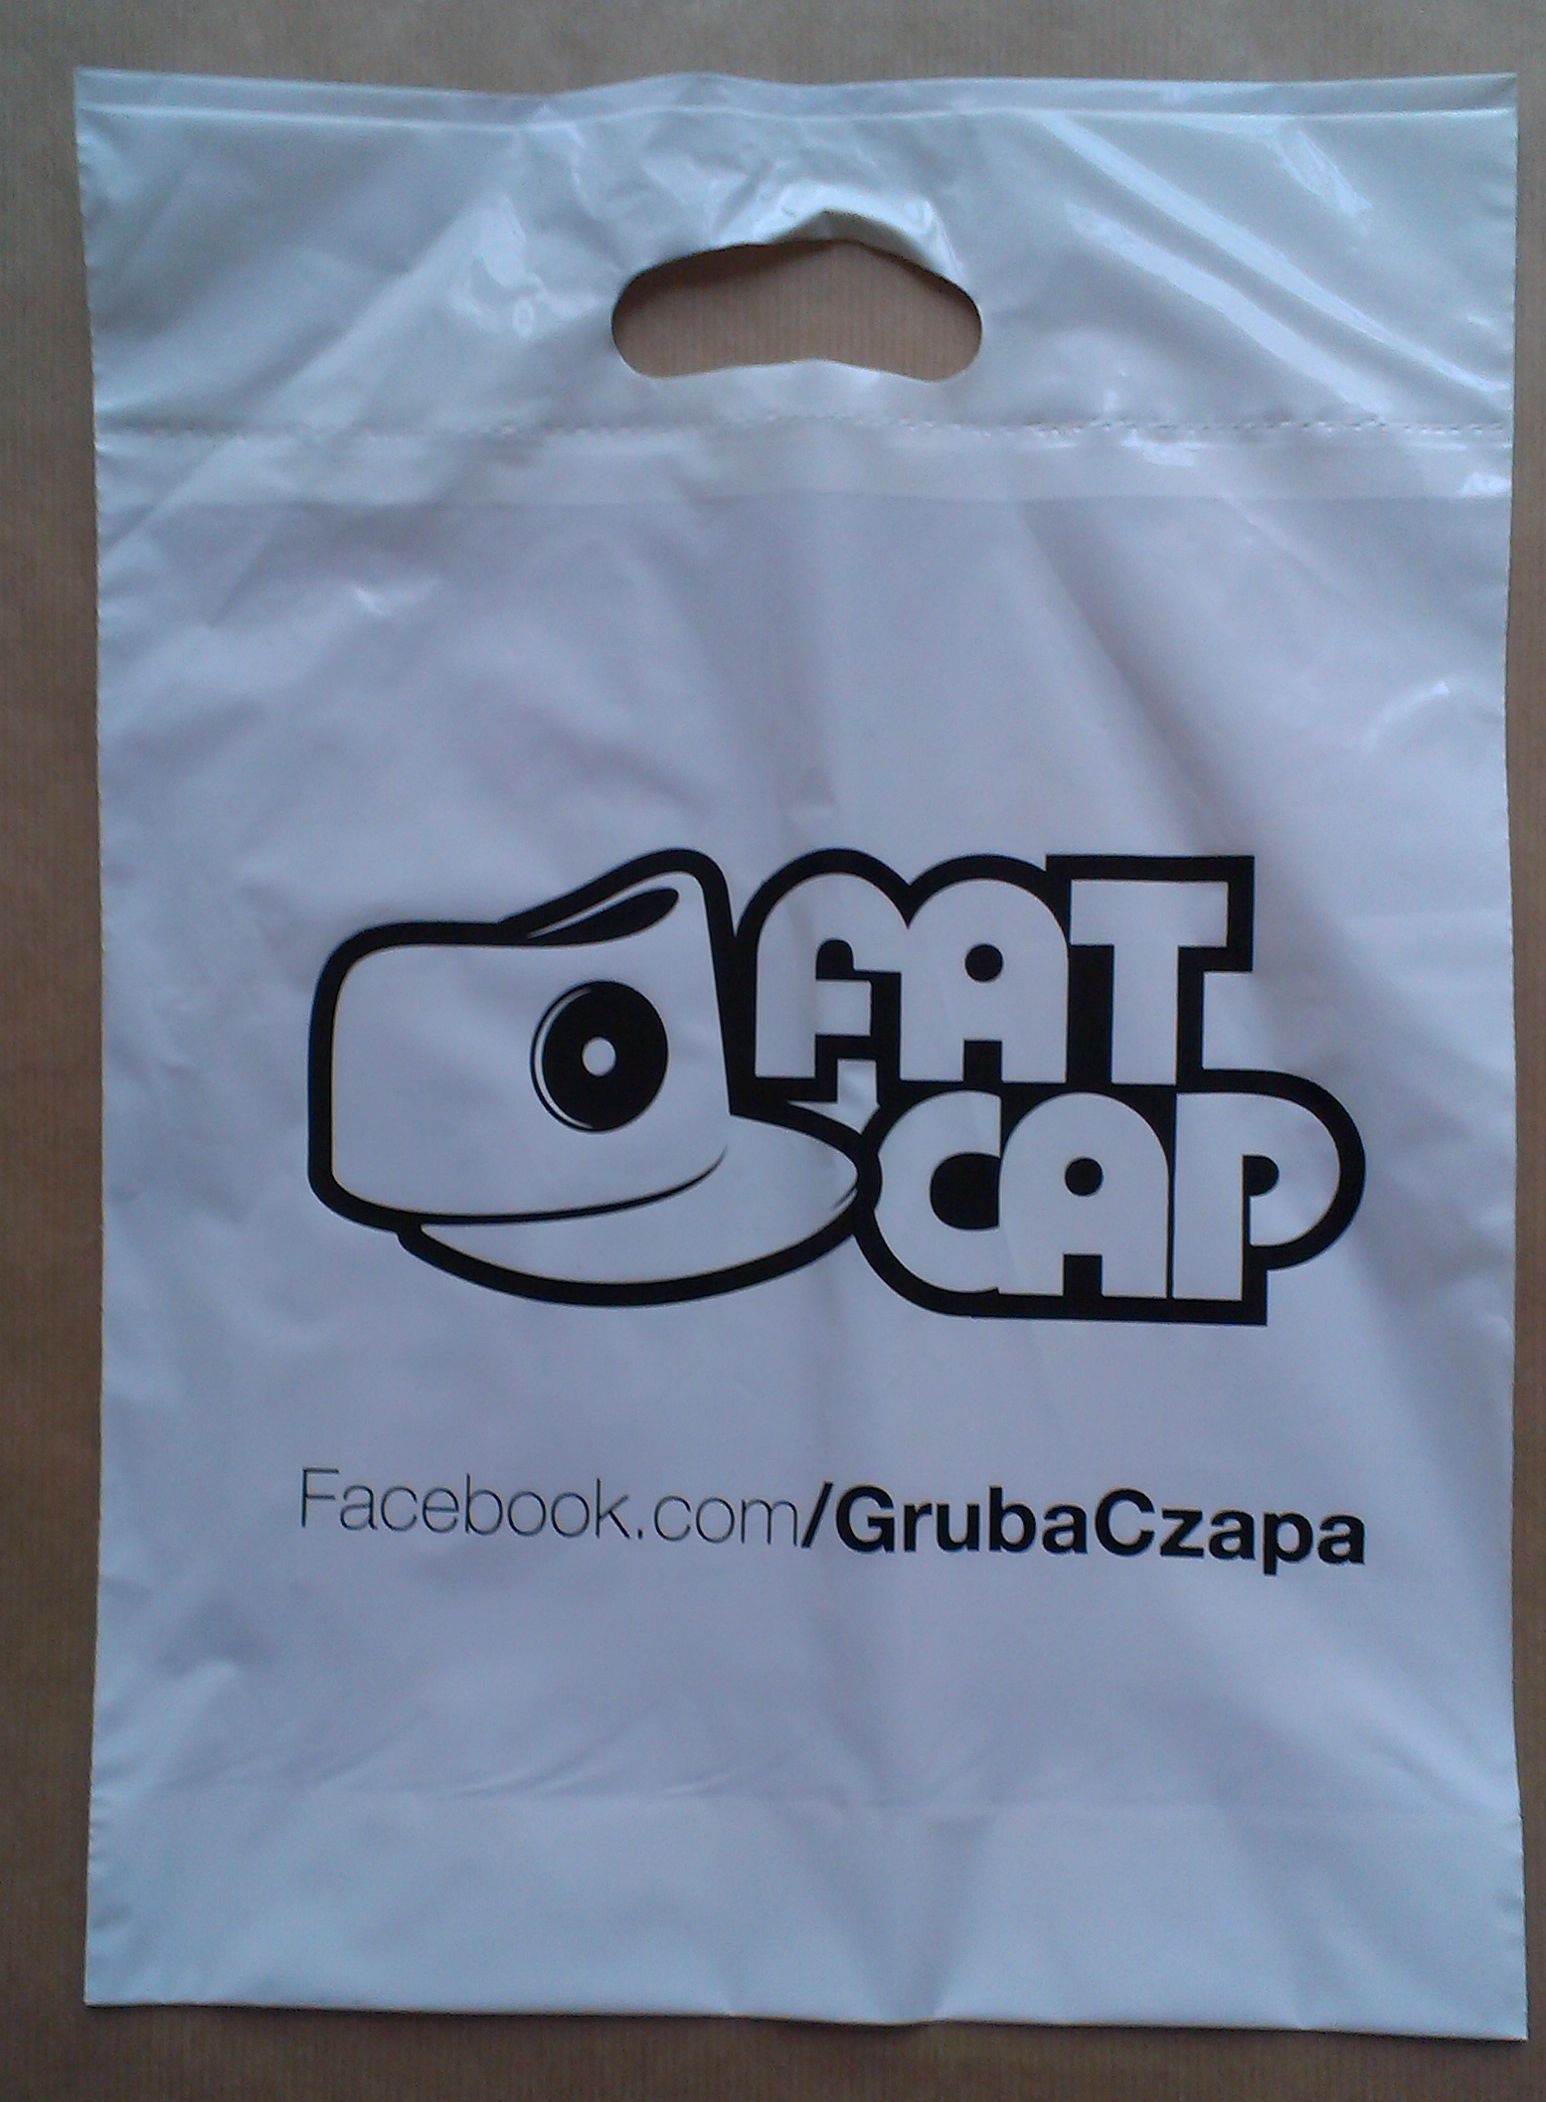 torby foliowe z logo - druk 1 kolor - Fatcap - pracownia kreska - drukarnia